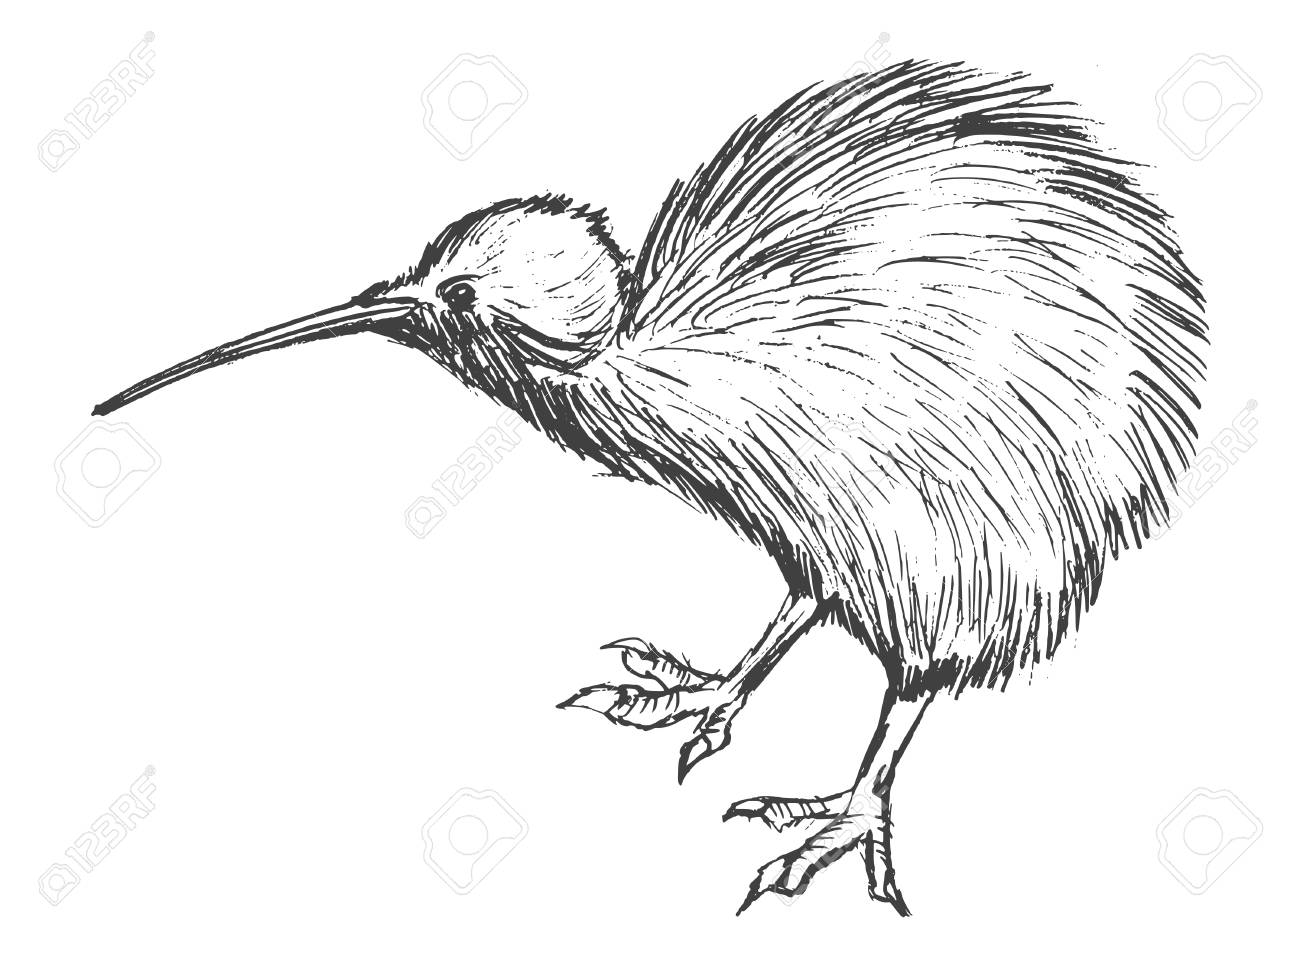 1300x974 Hand Drawn Illustration Of Kiwi Bird Royalty Free Cliparts